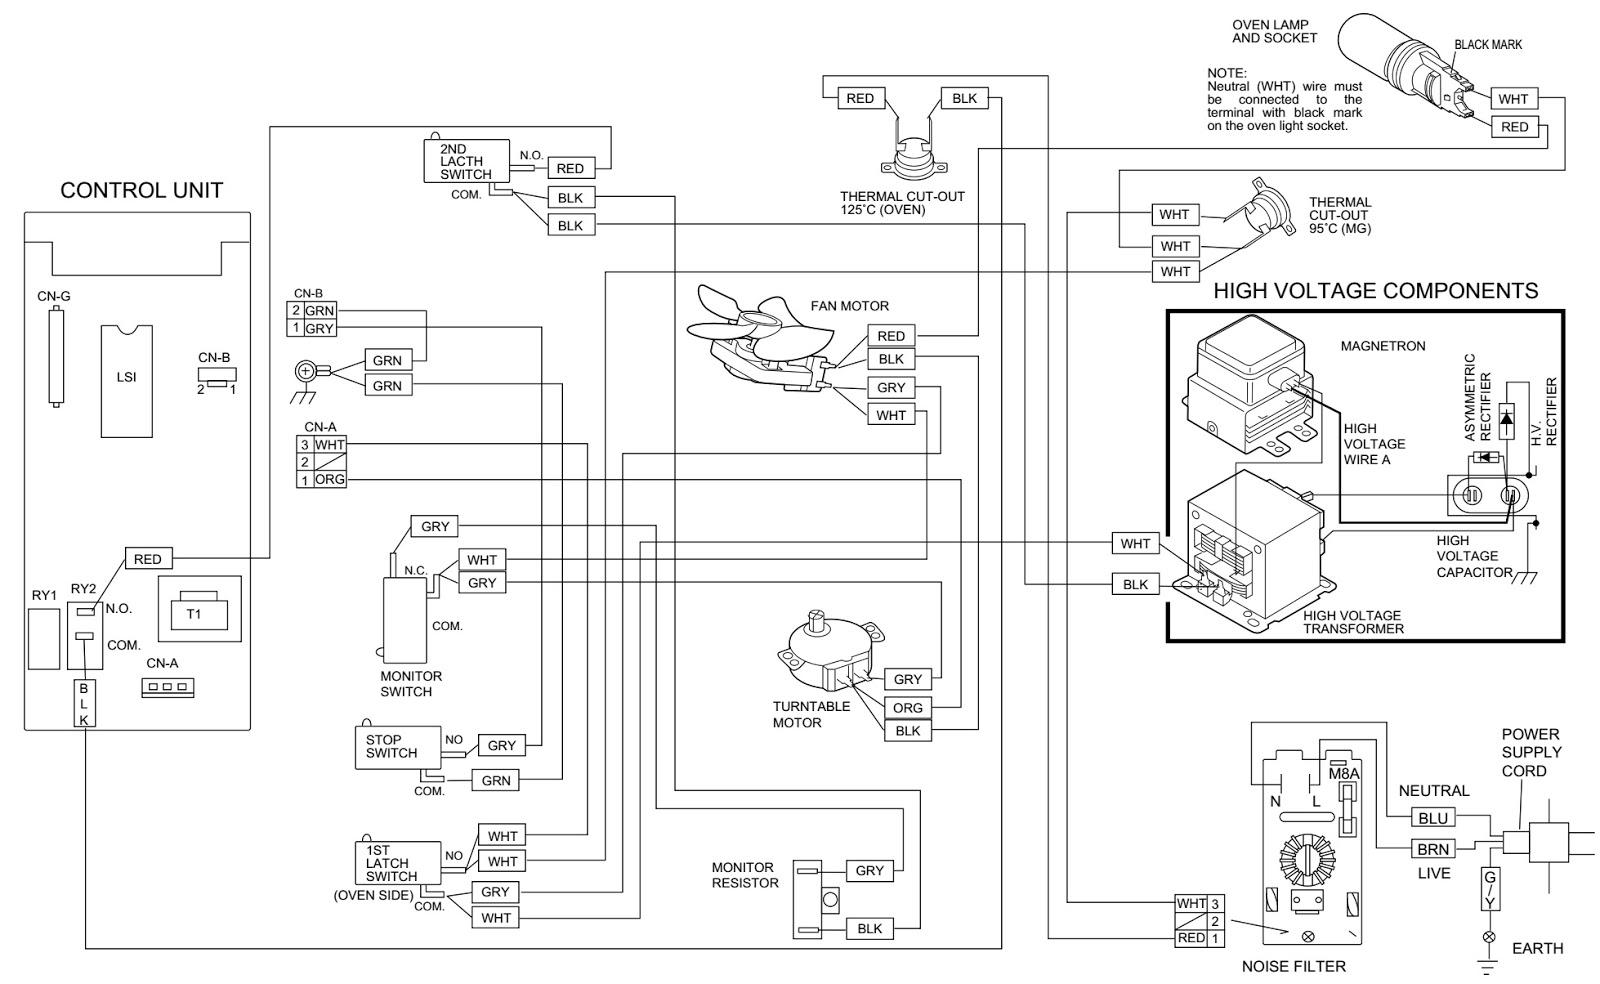 small resolution of ge refrigerator wiring diagram 1967 18 20 tridonicsignage de u2022ge refrigerator wiring diagram 1967 best